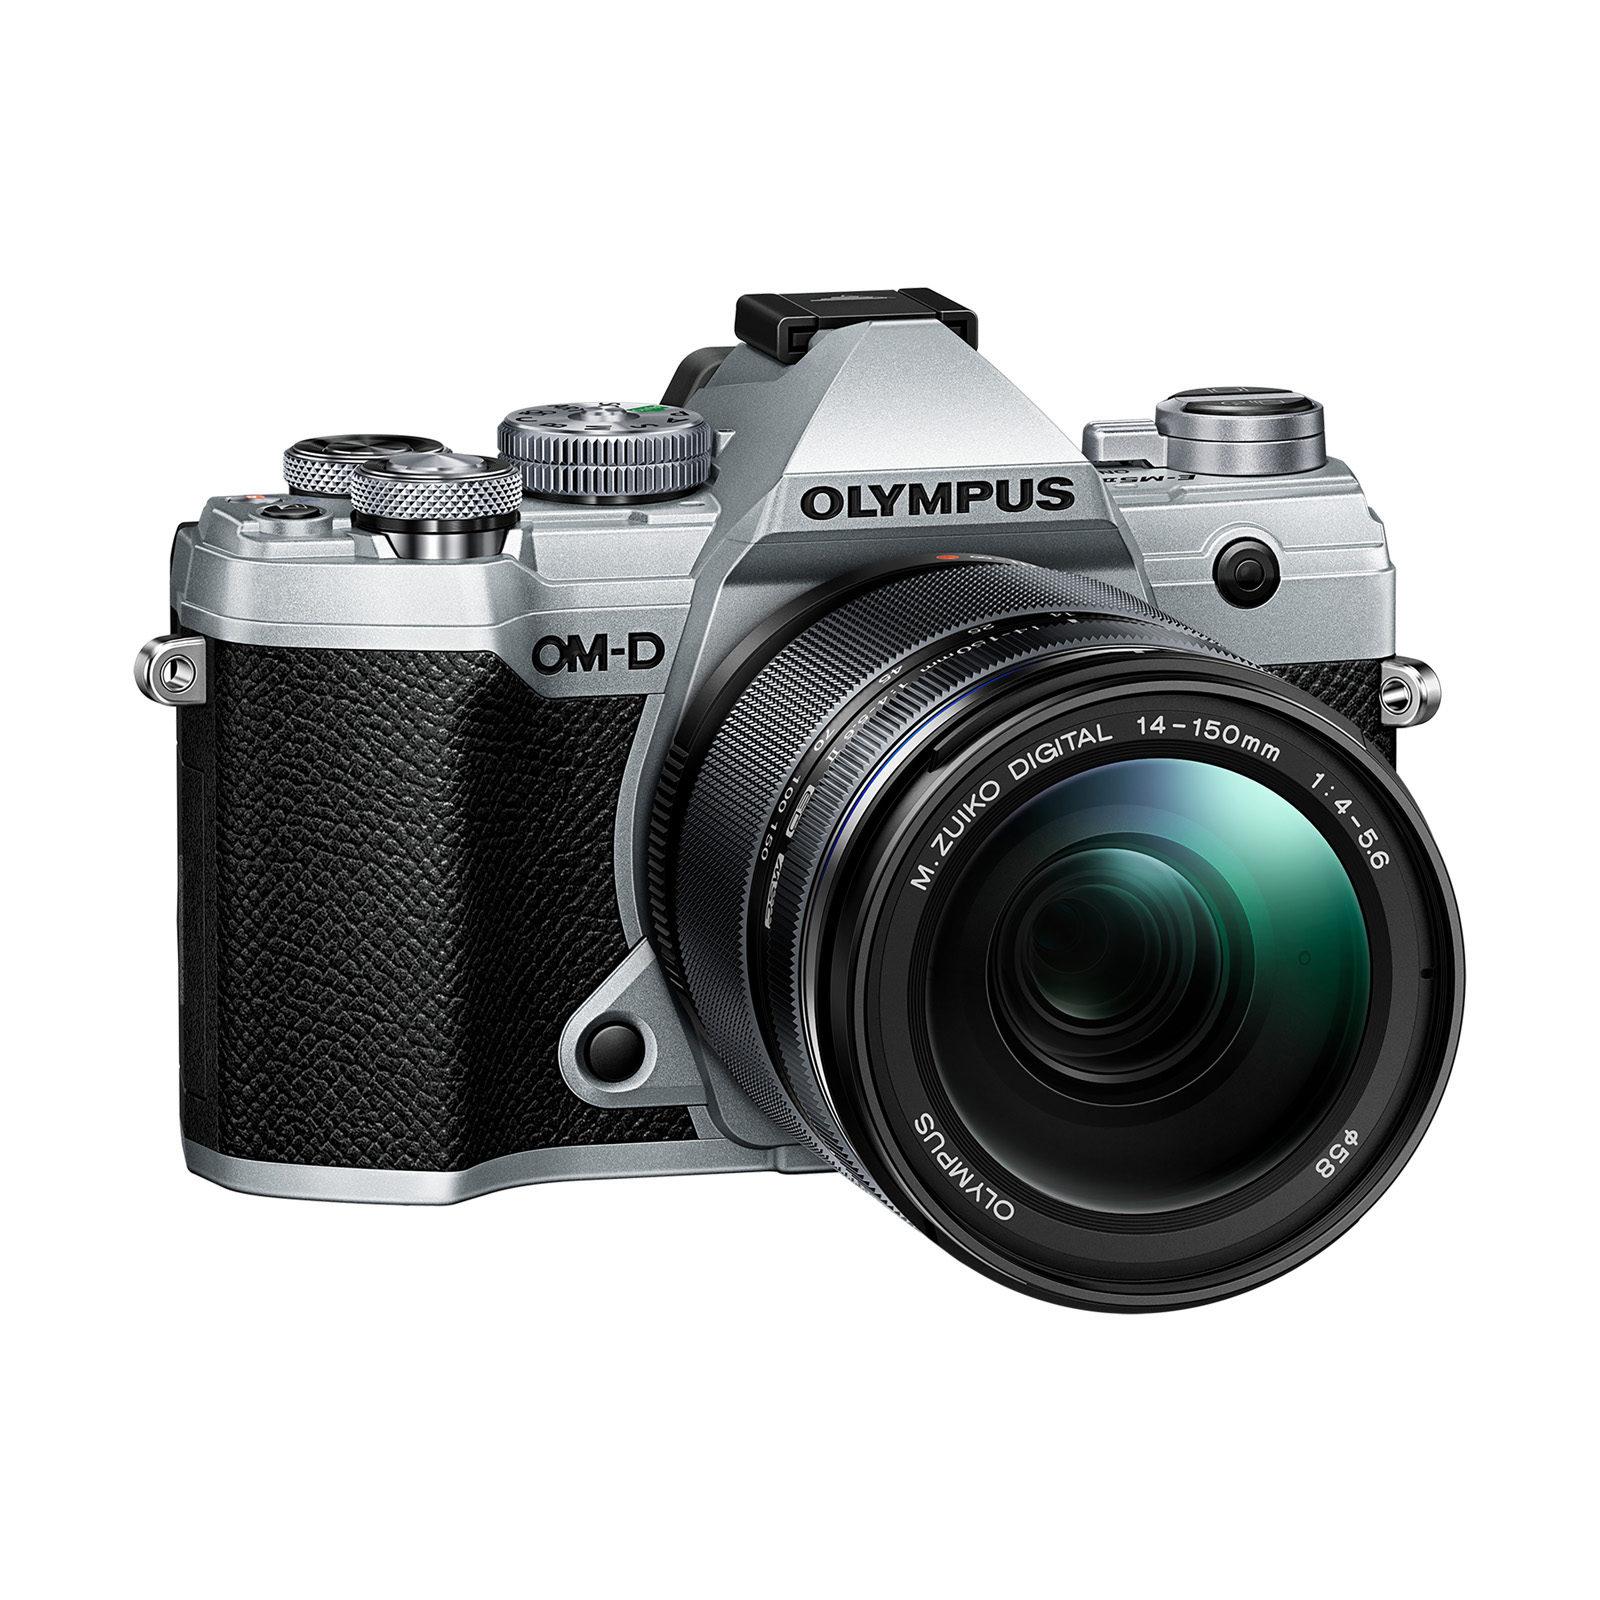 Olympus OM-D E-M5 Mark III Prata + 14-150mm Preto